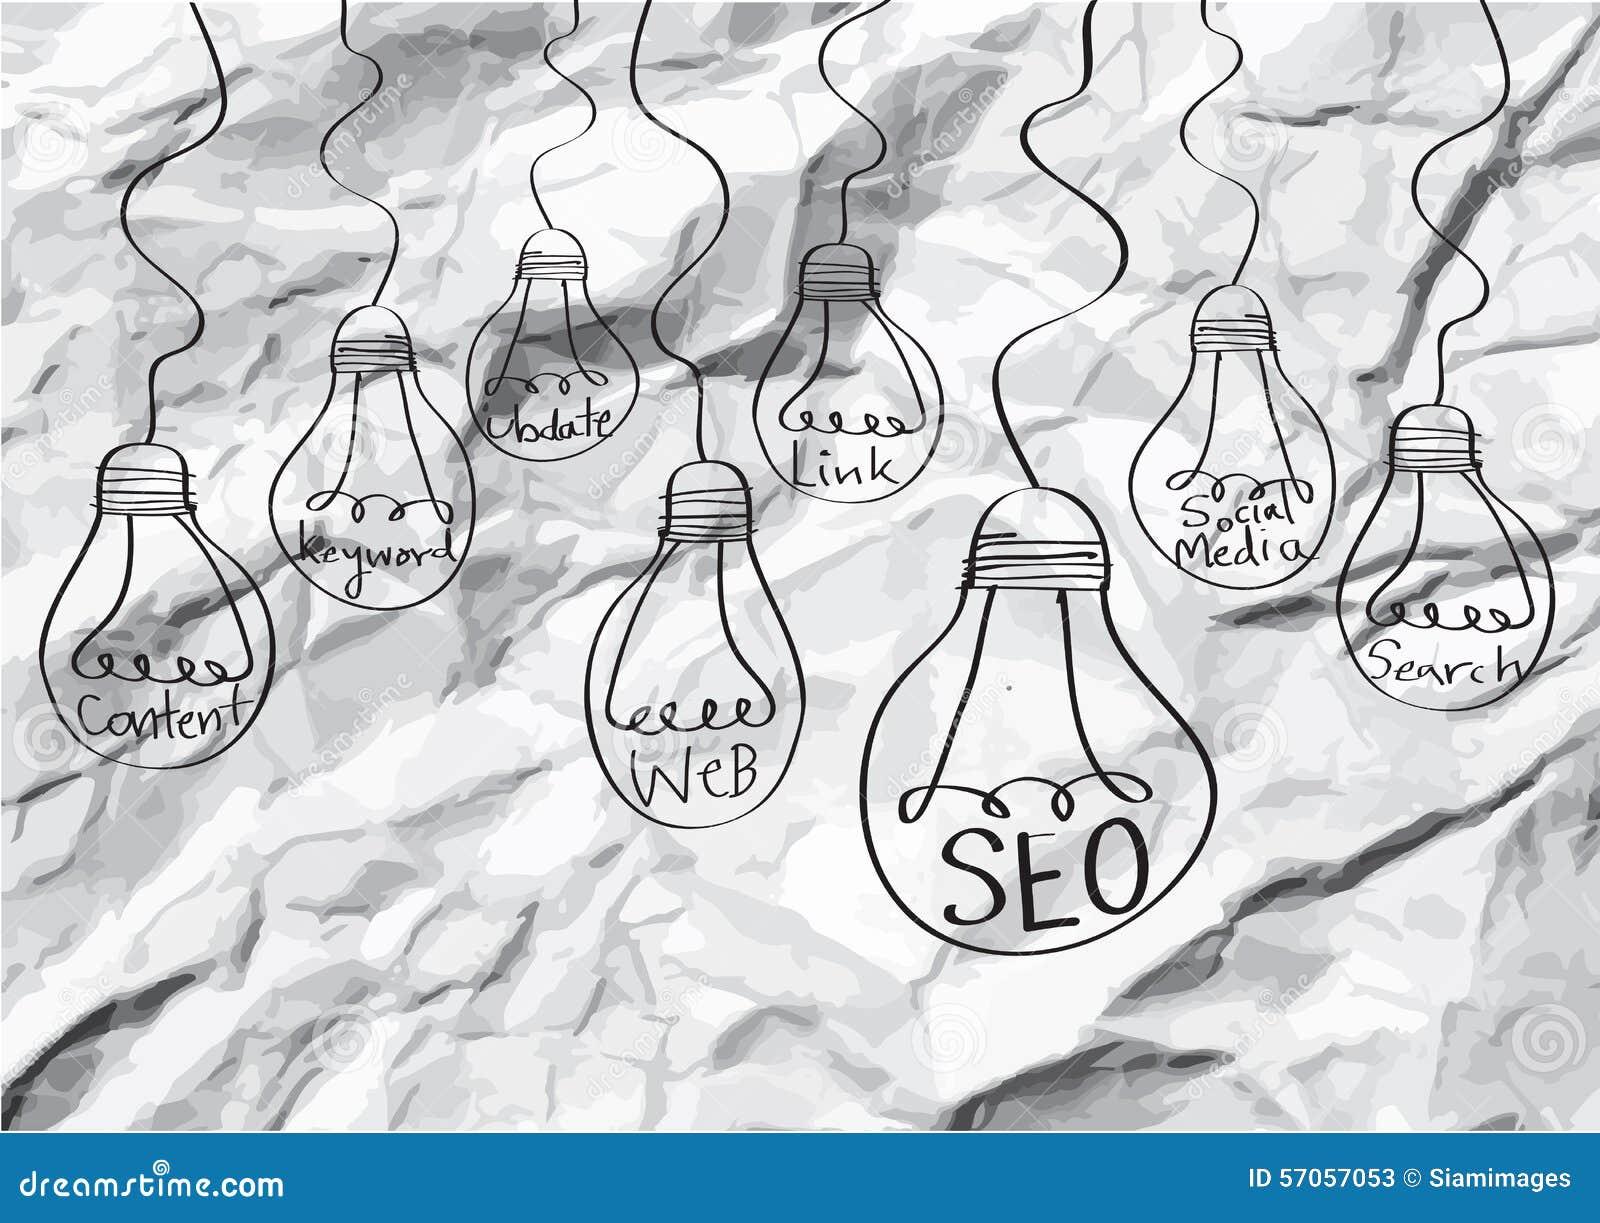 Seo Idea SEO Search Engine Optimization op verfrommeld document